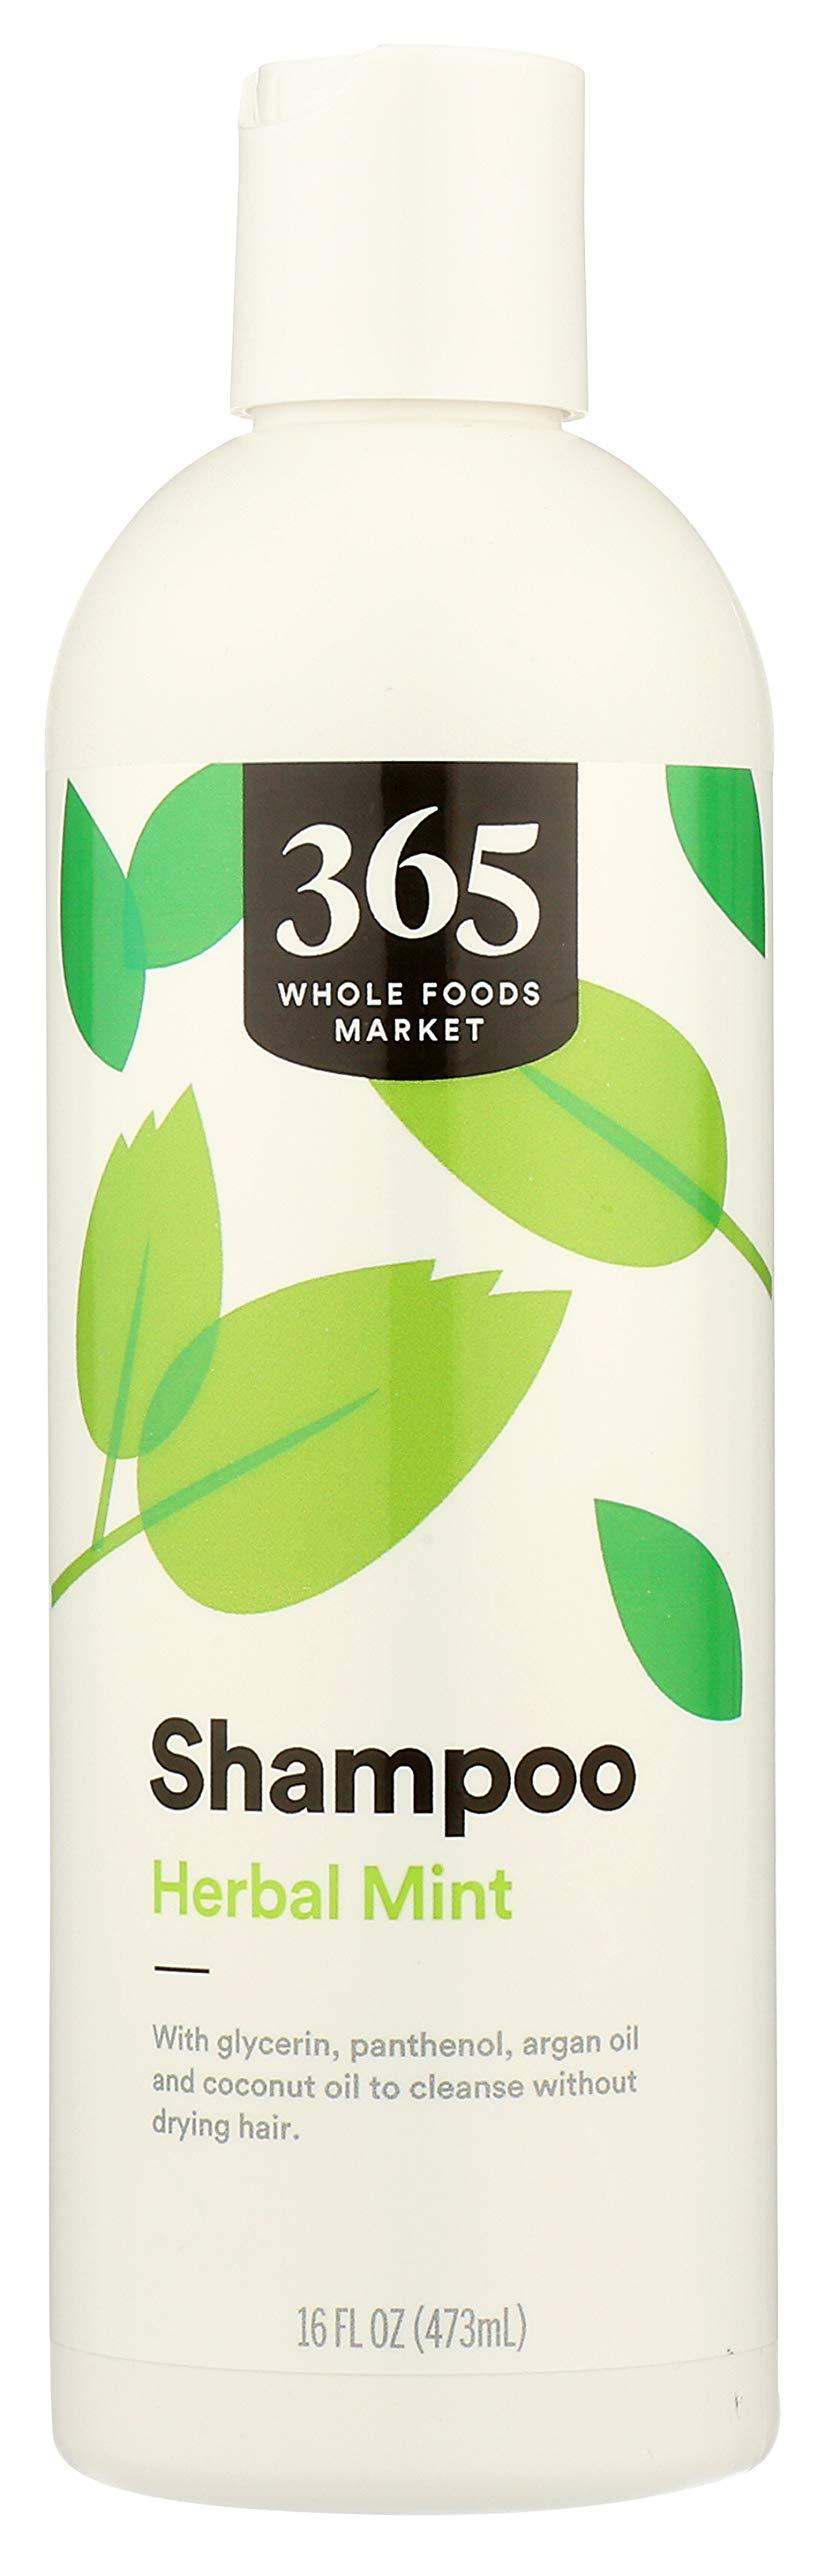 365 by Whole Foods Market, Hair Shampoo, Herbal Mint, 16 Fl Oz